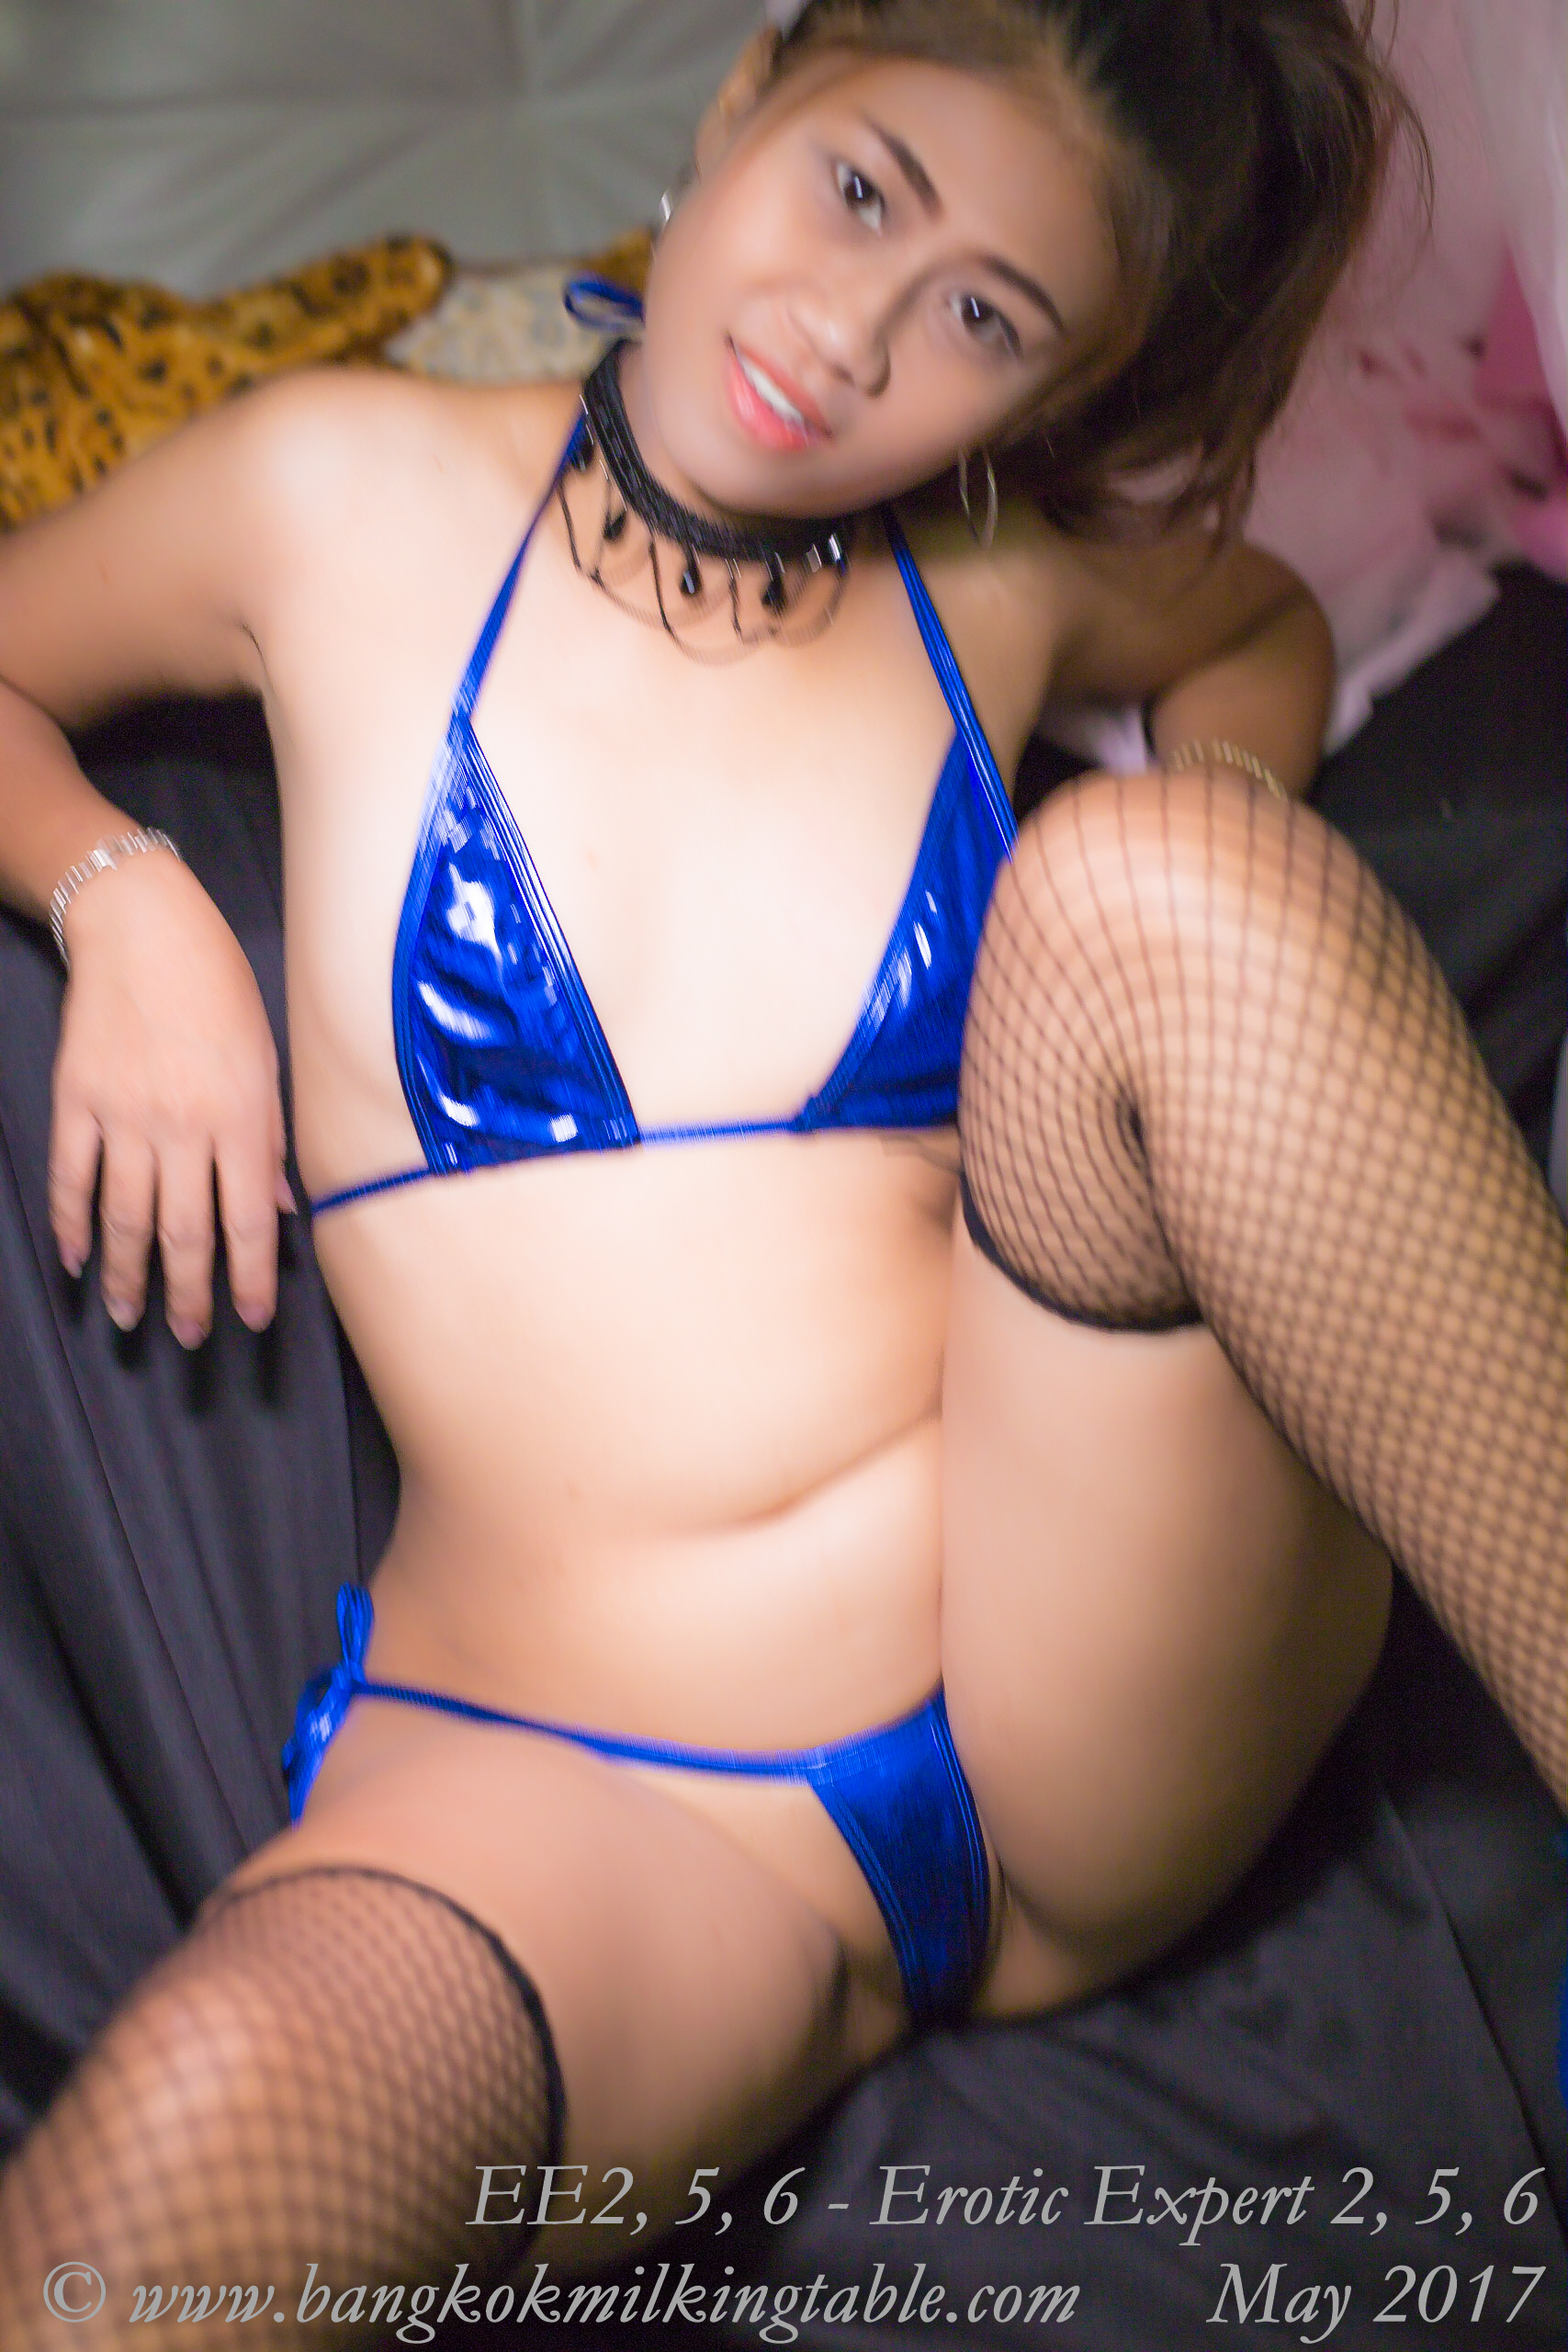 Erotic Expert 2, 5, 6 - string bikini - Bangkok Escort Massage Milking 0517-88